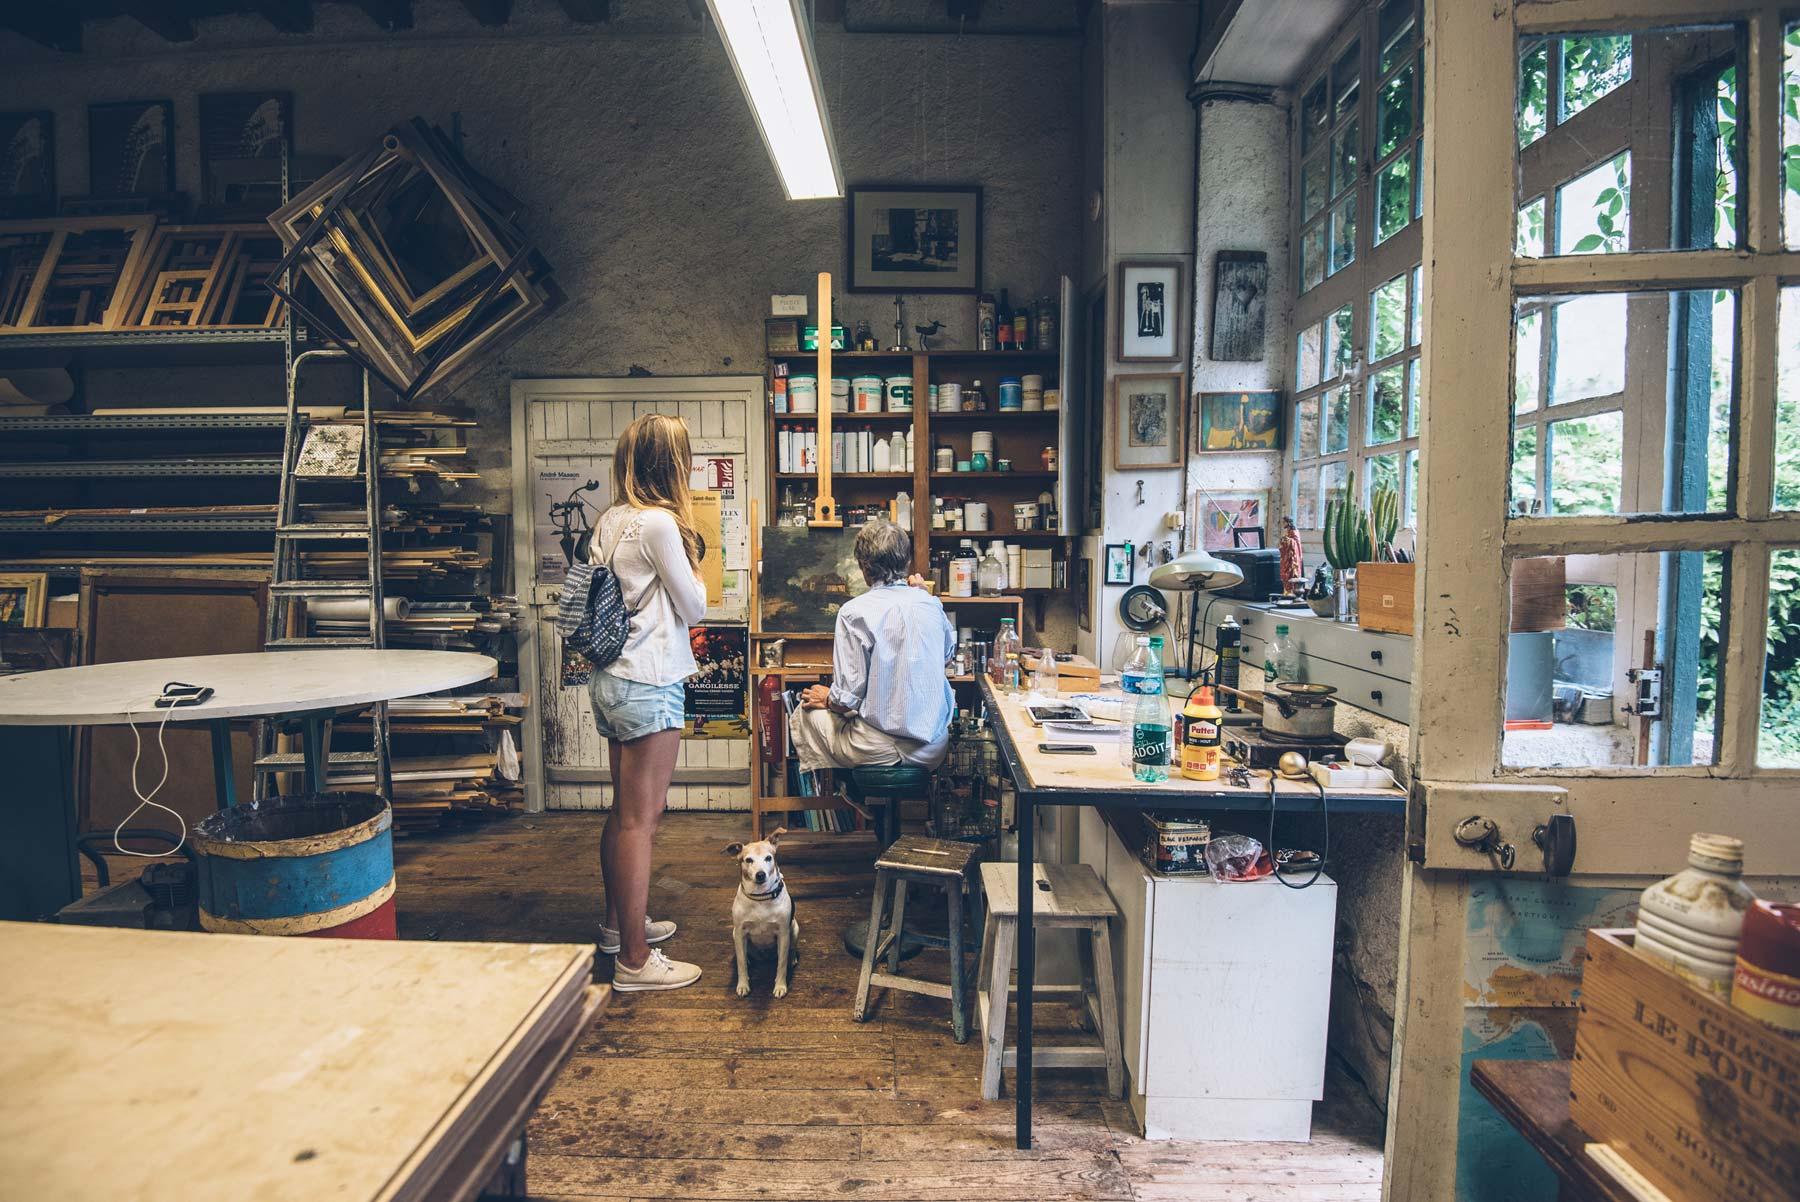 Rencontre avec Catherine, restauratrice d'art